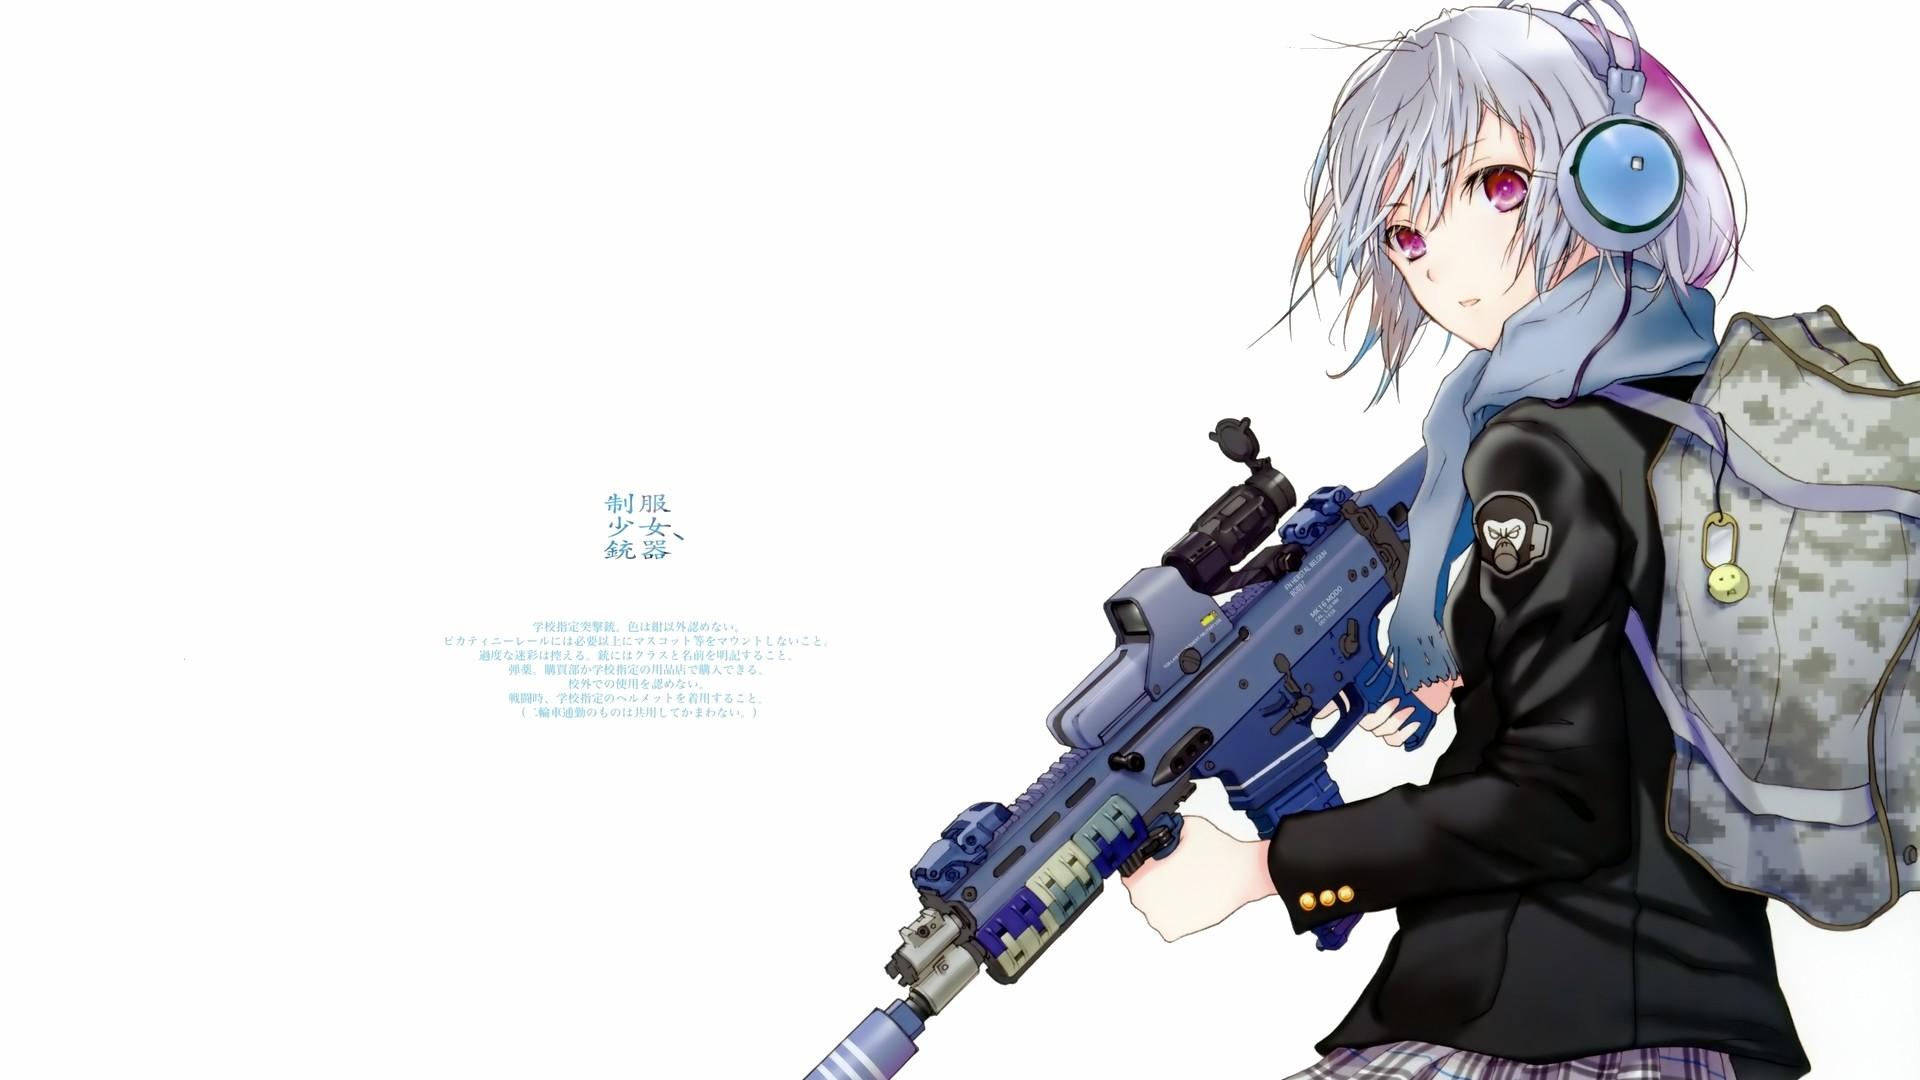 8. anime phone wallpapers HD8